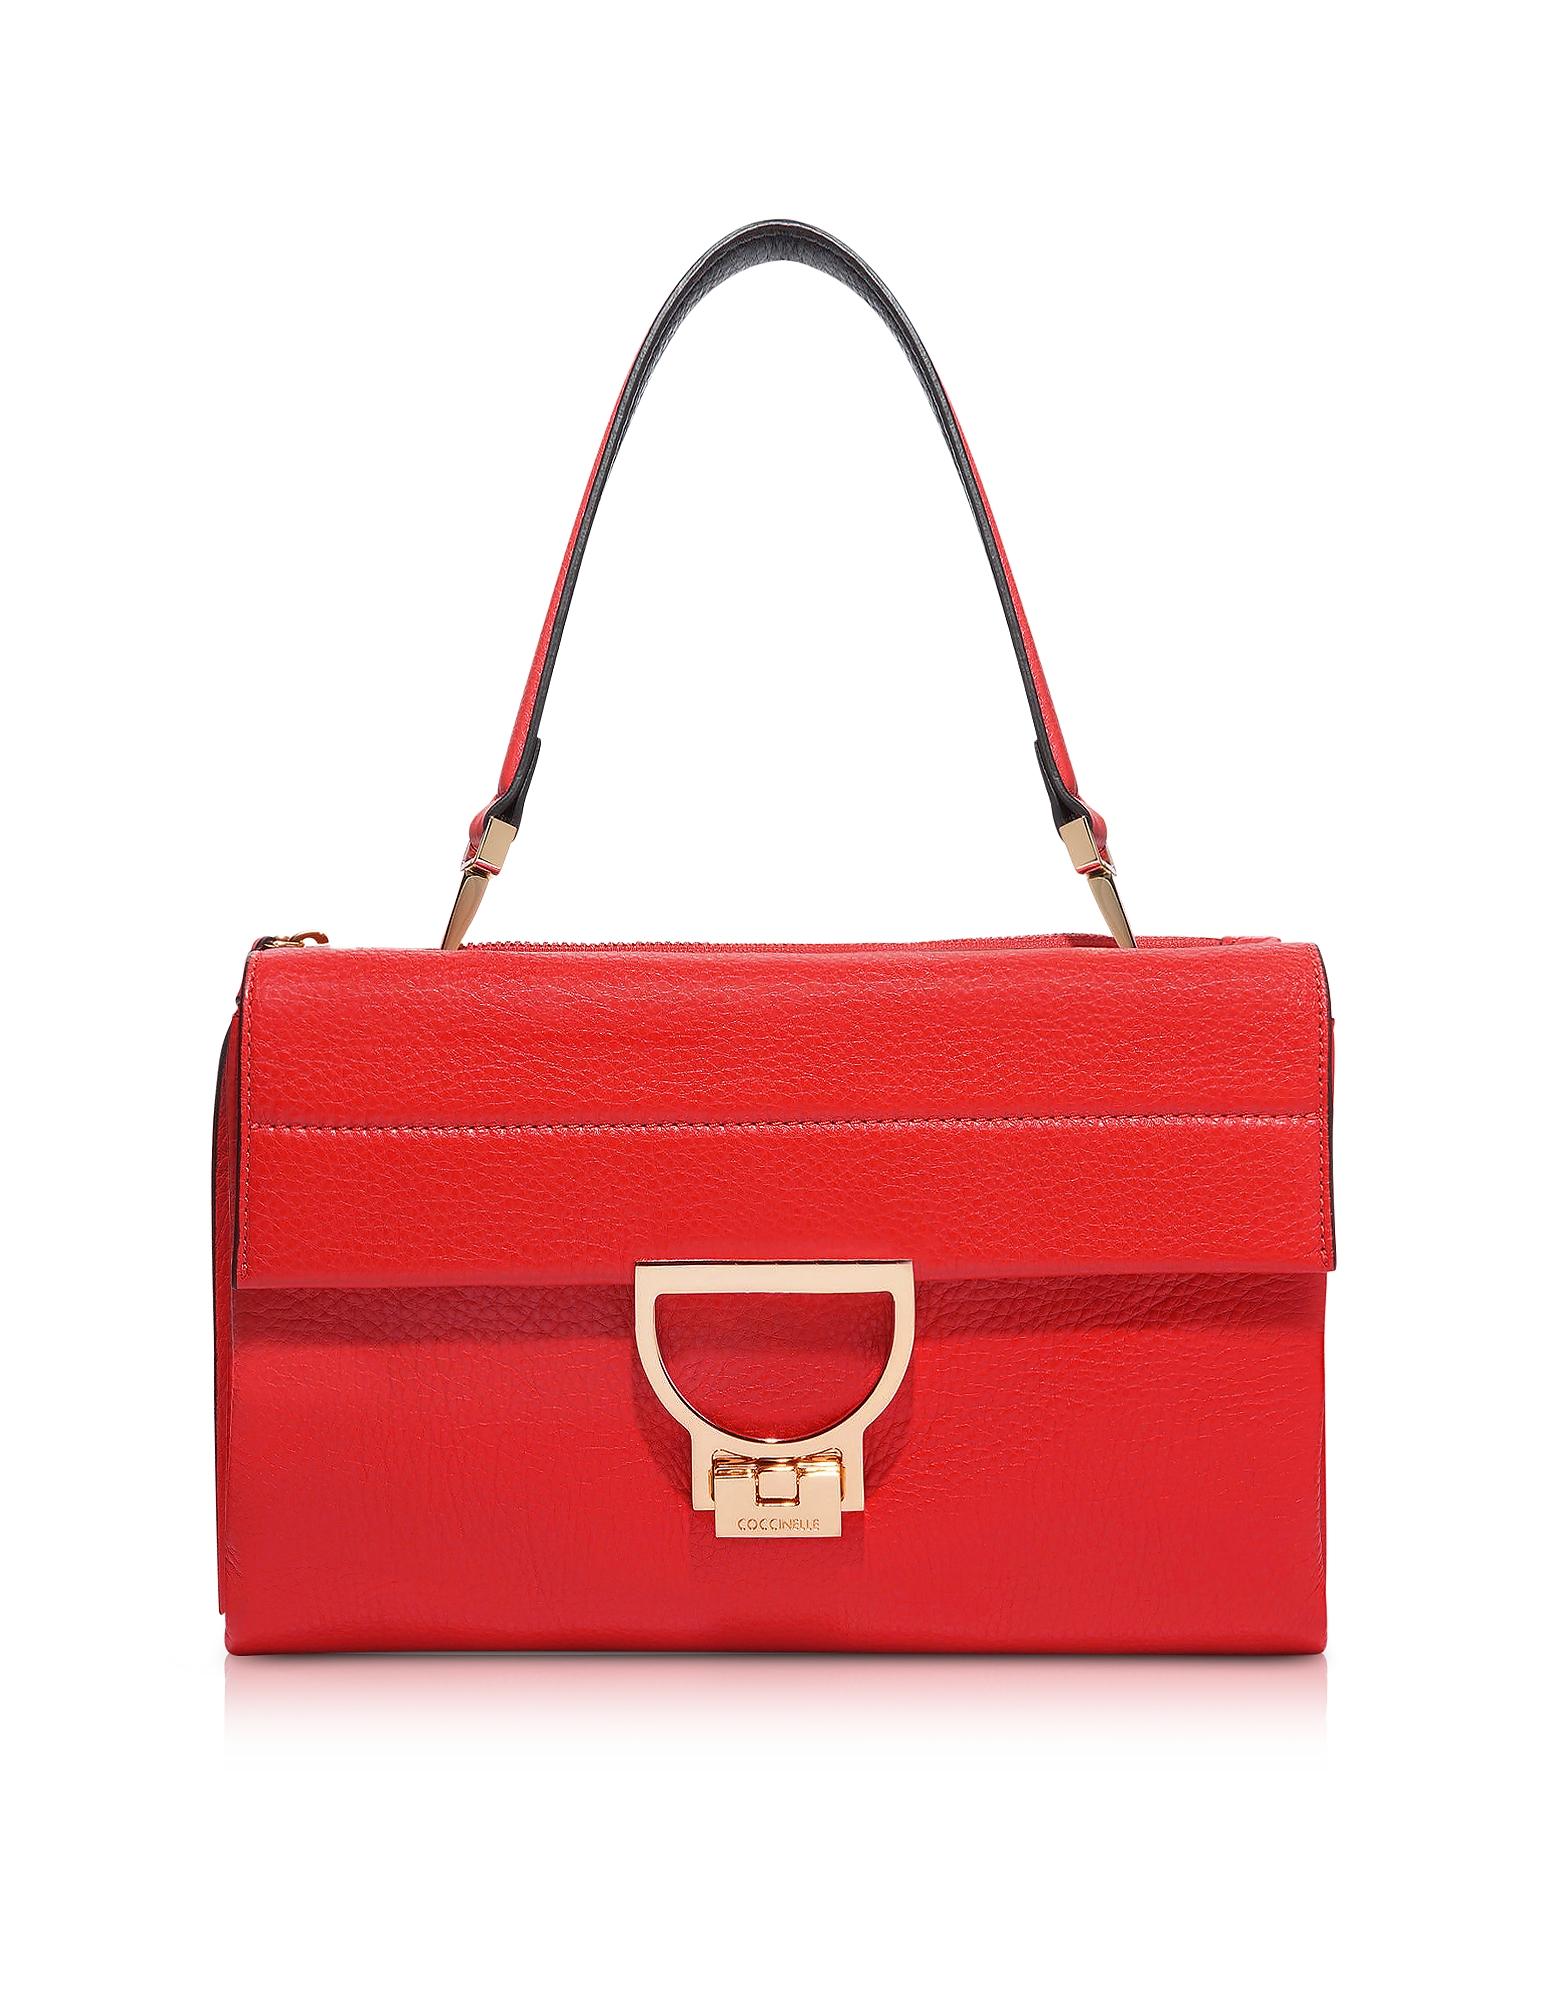 Coccinelle Handbags, Coquelicot Pebbled Leather Arlettis Shoulder Bag